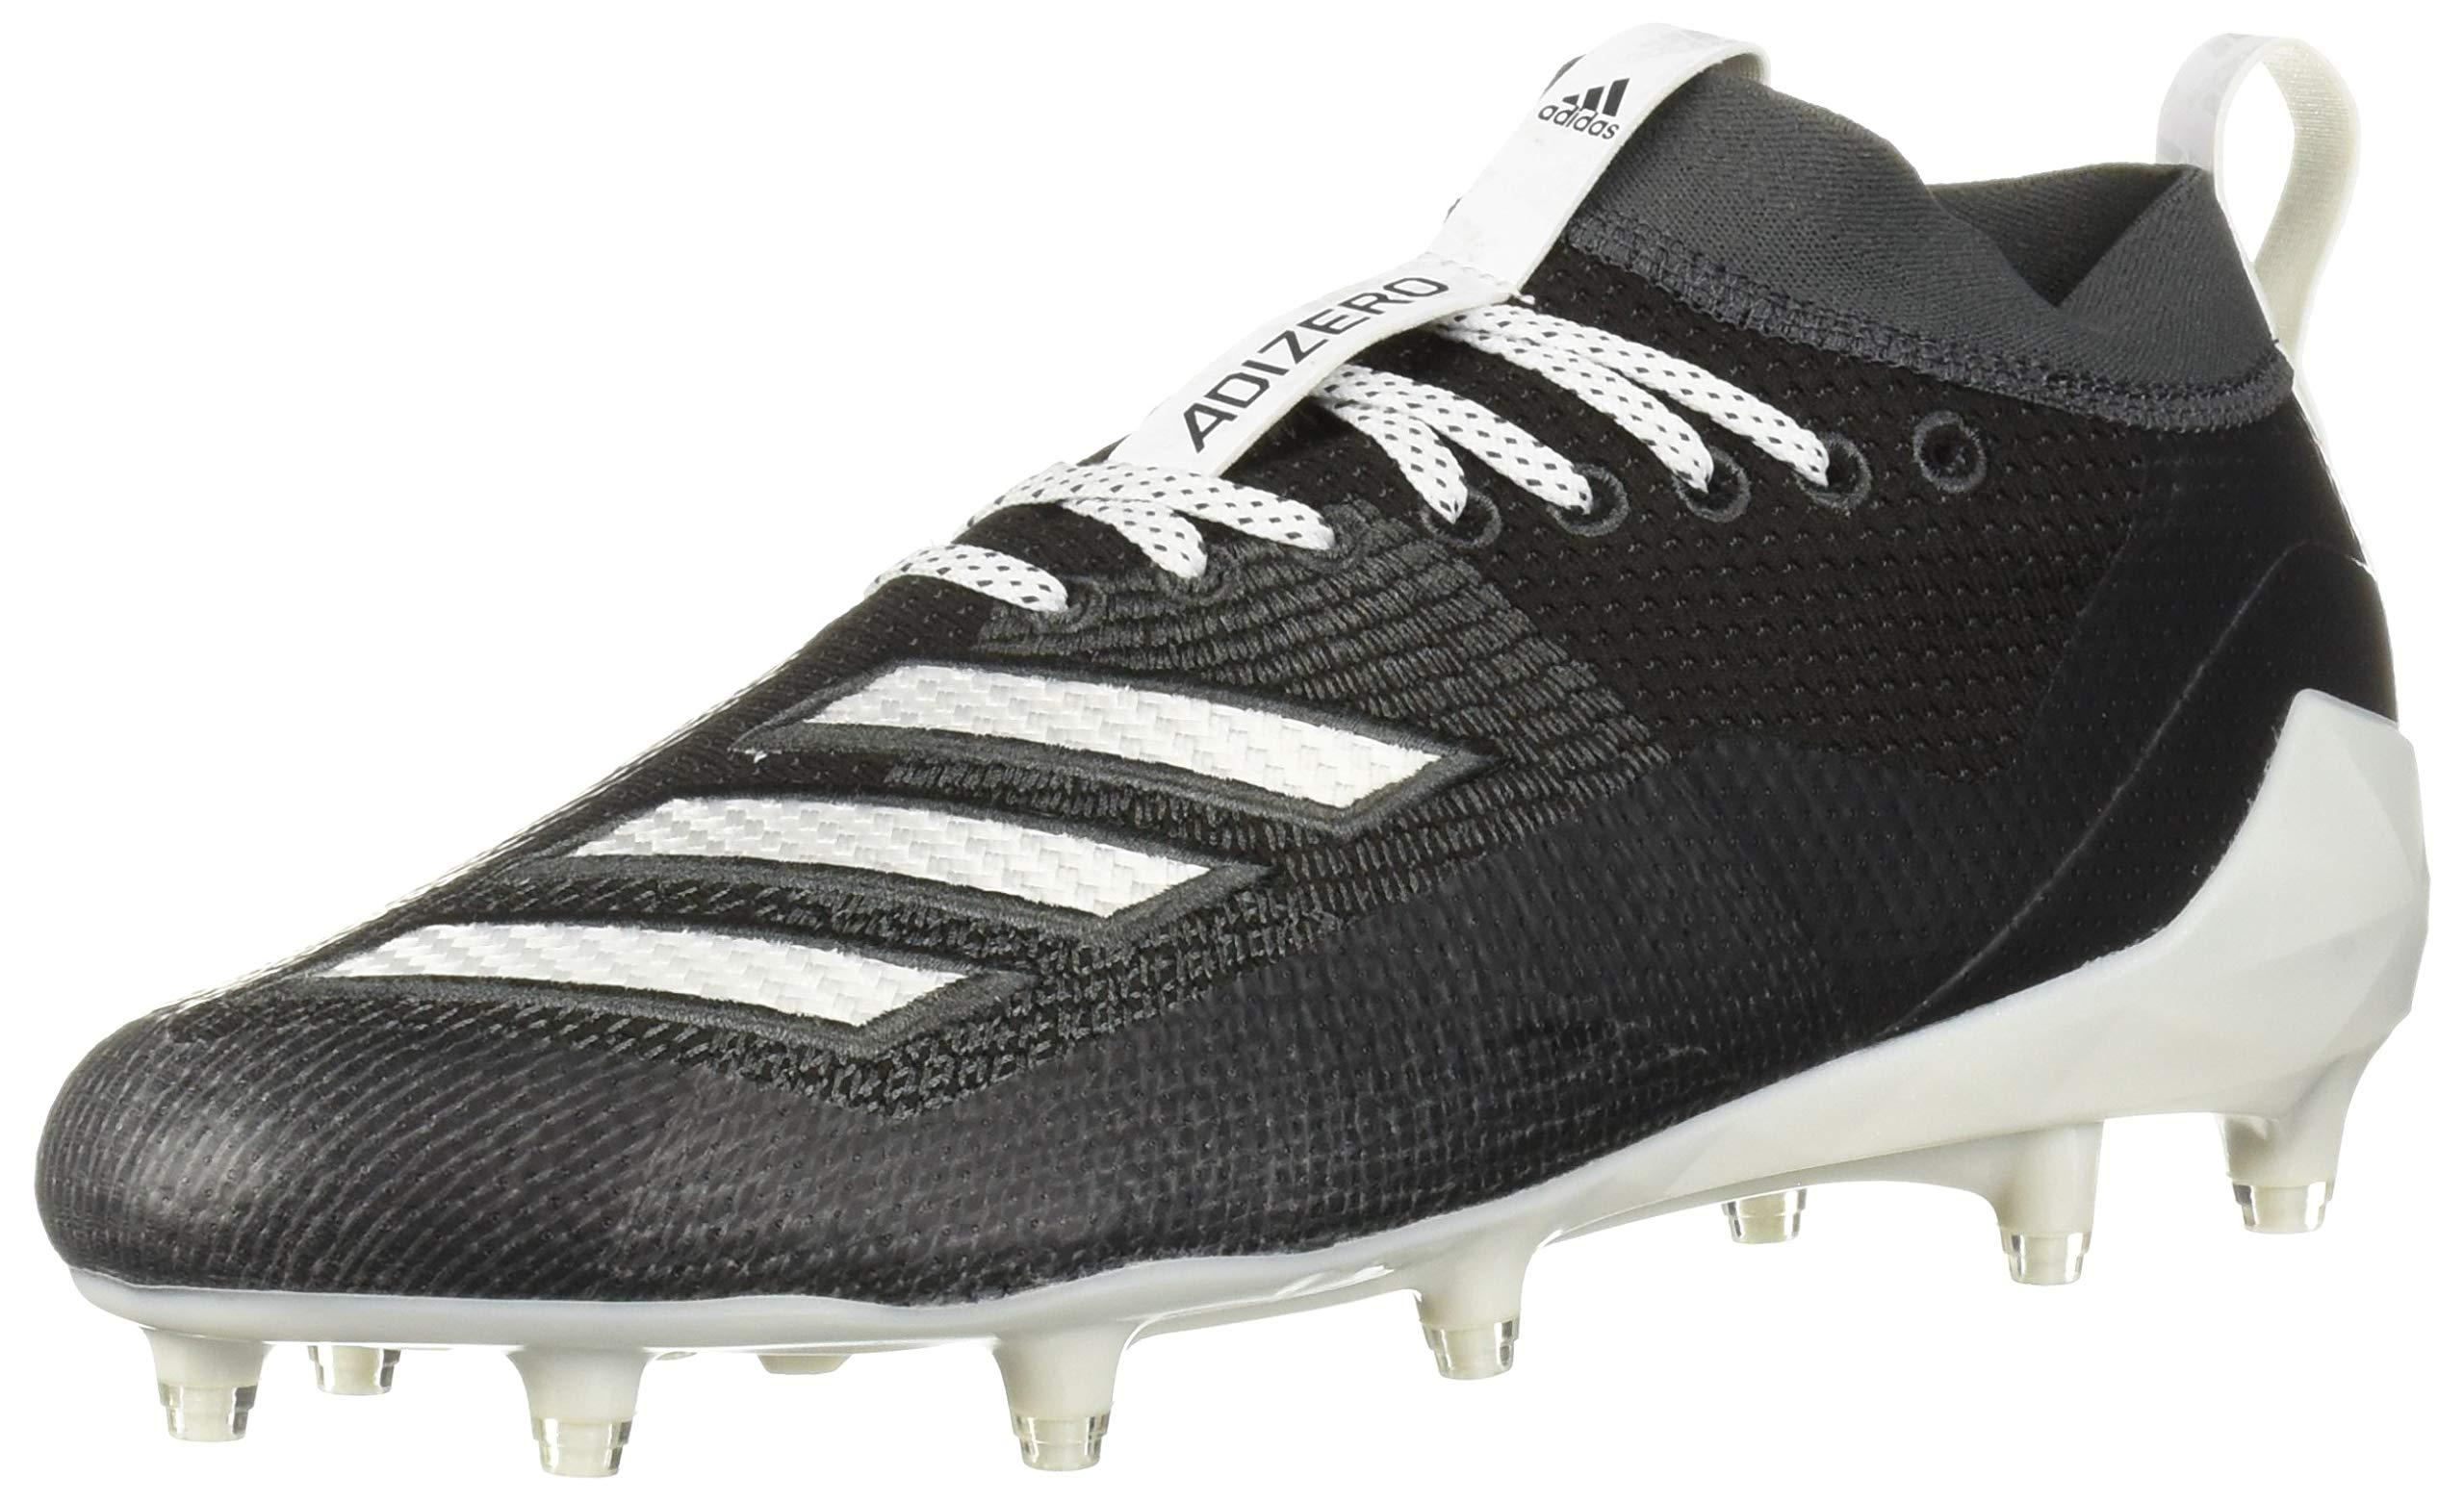 adidas Men's Adizero 8.0 Football Shoe Black/White/Grey 6.5 M US by adidas (Image #1)